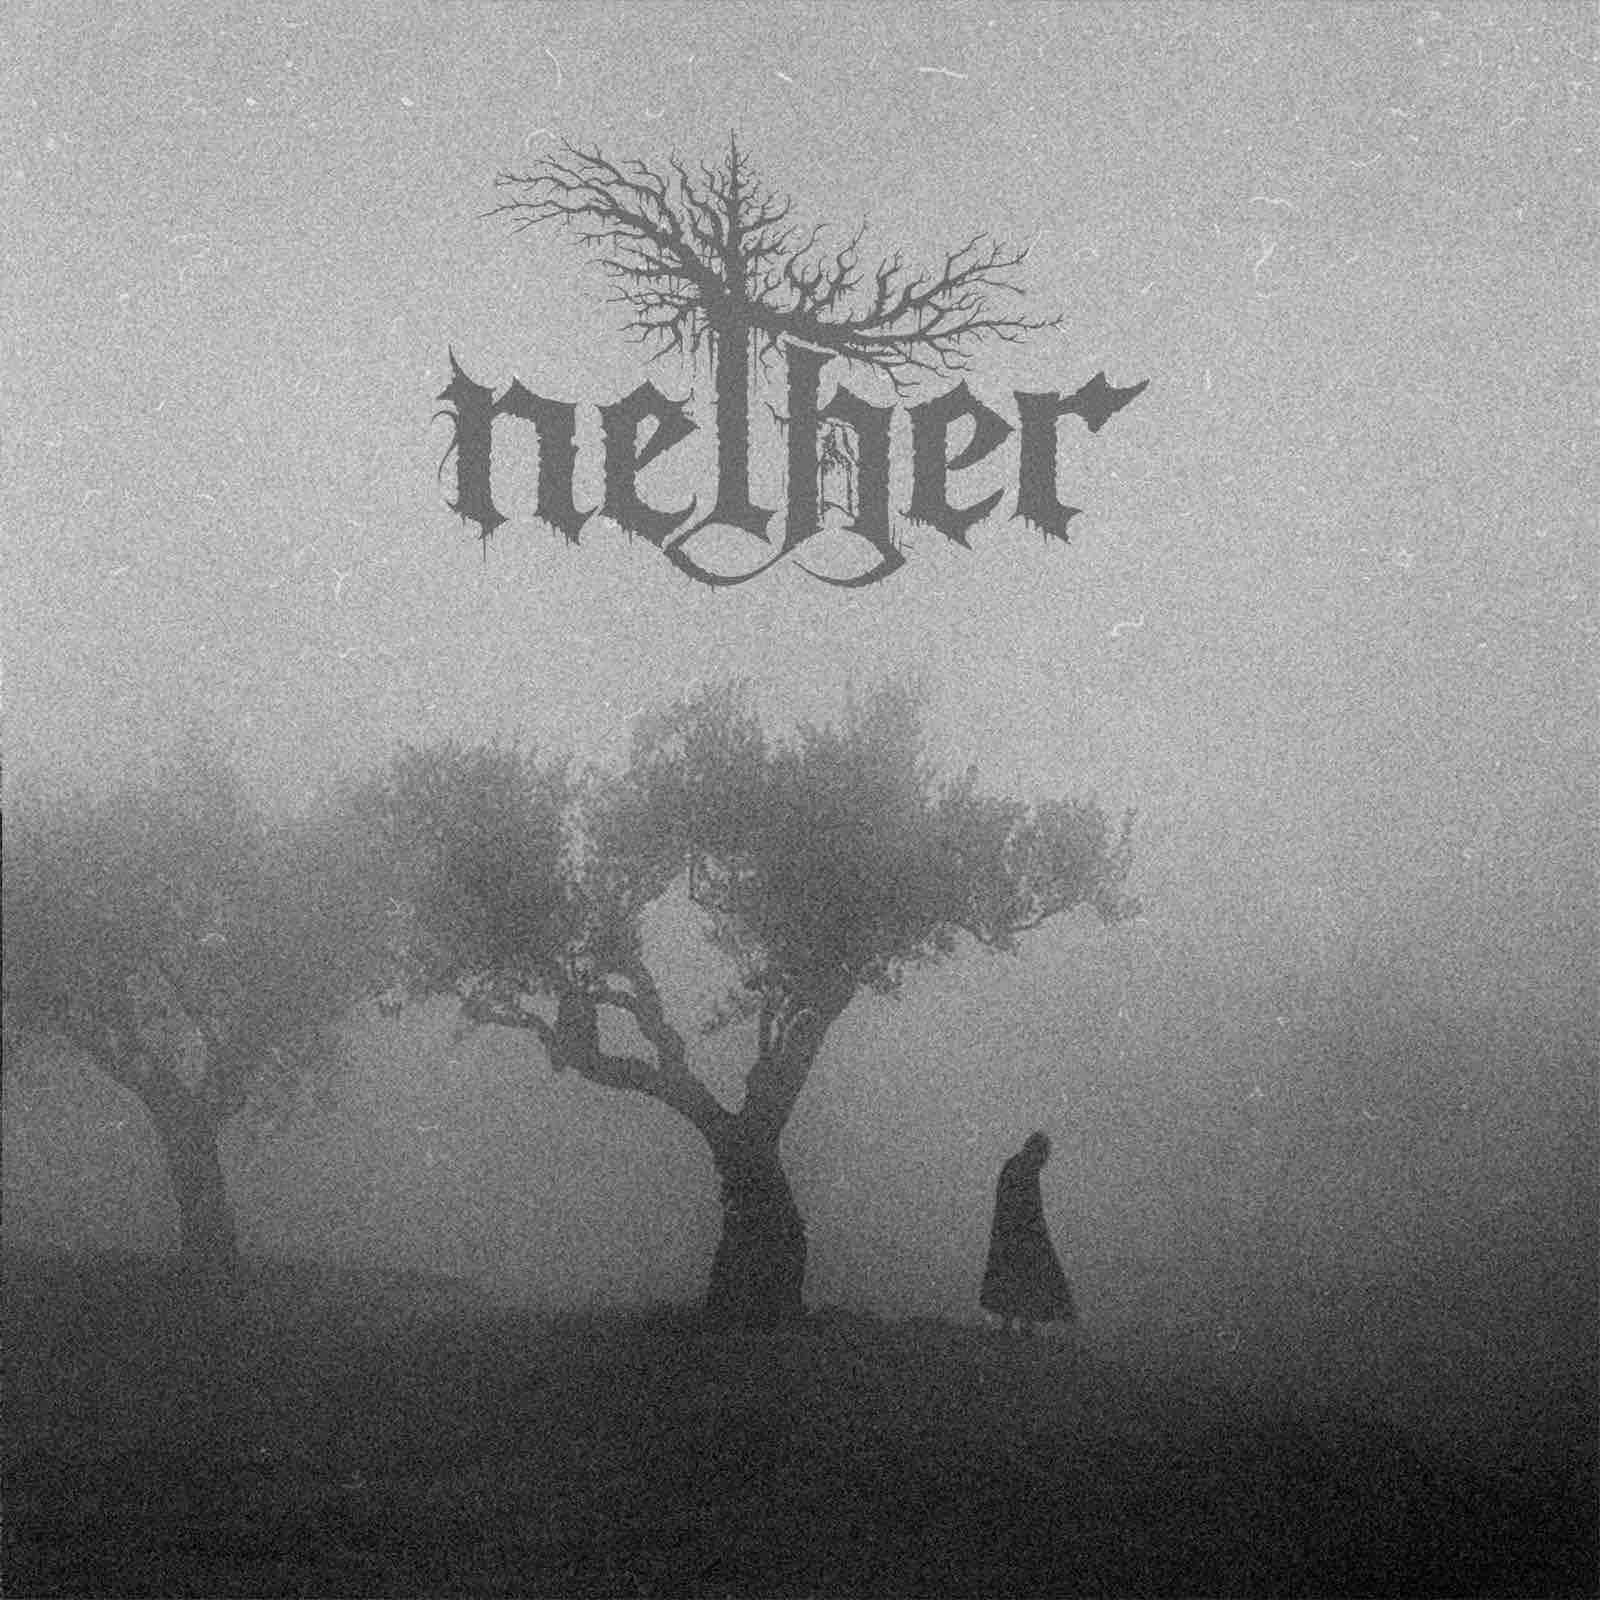 Entrevista – Interview: nether